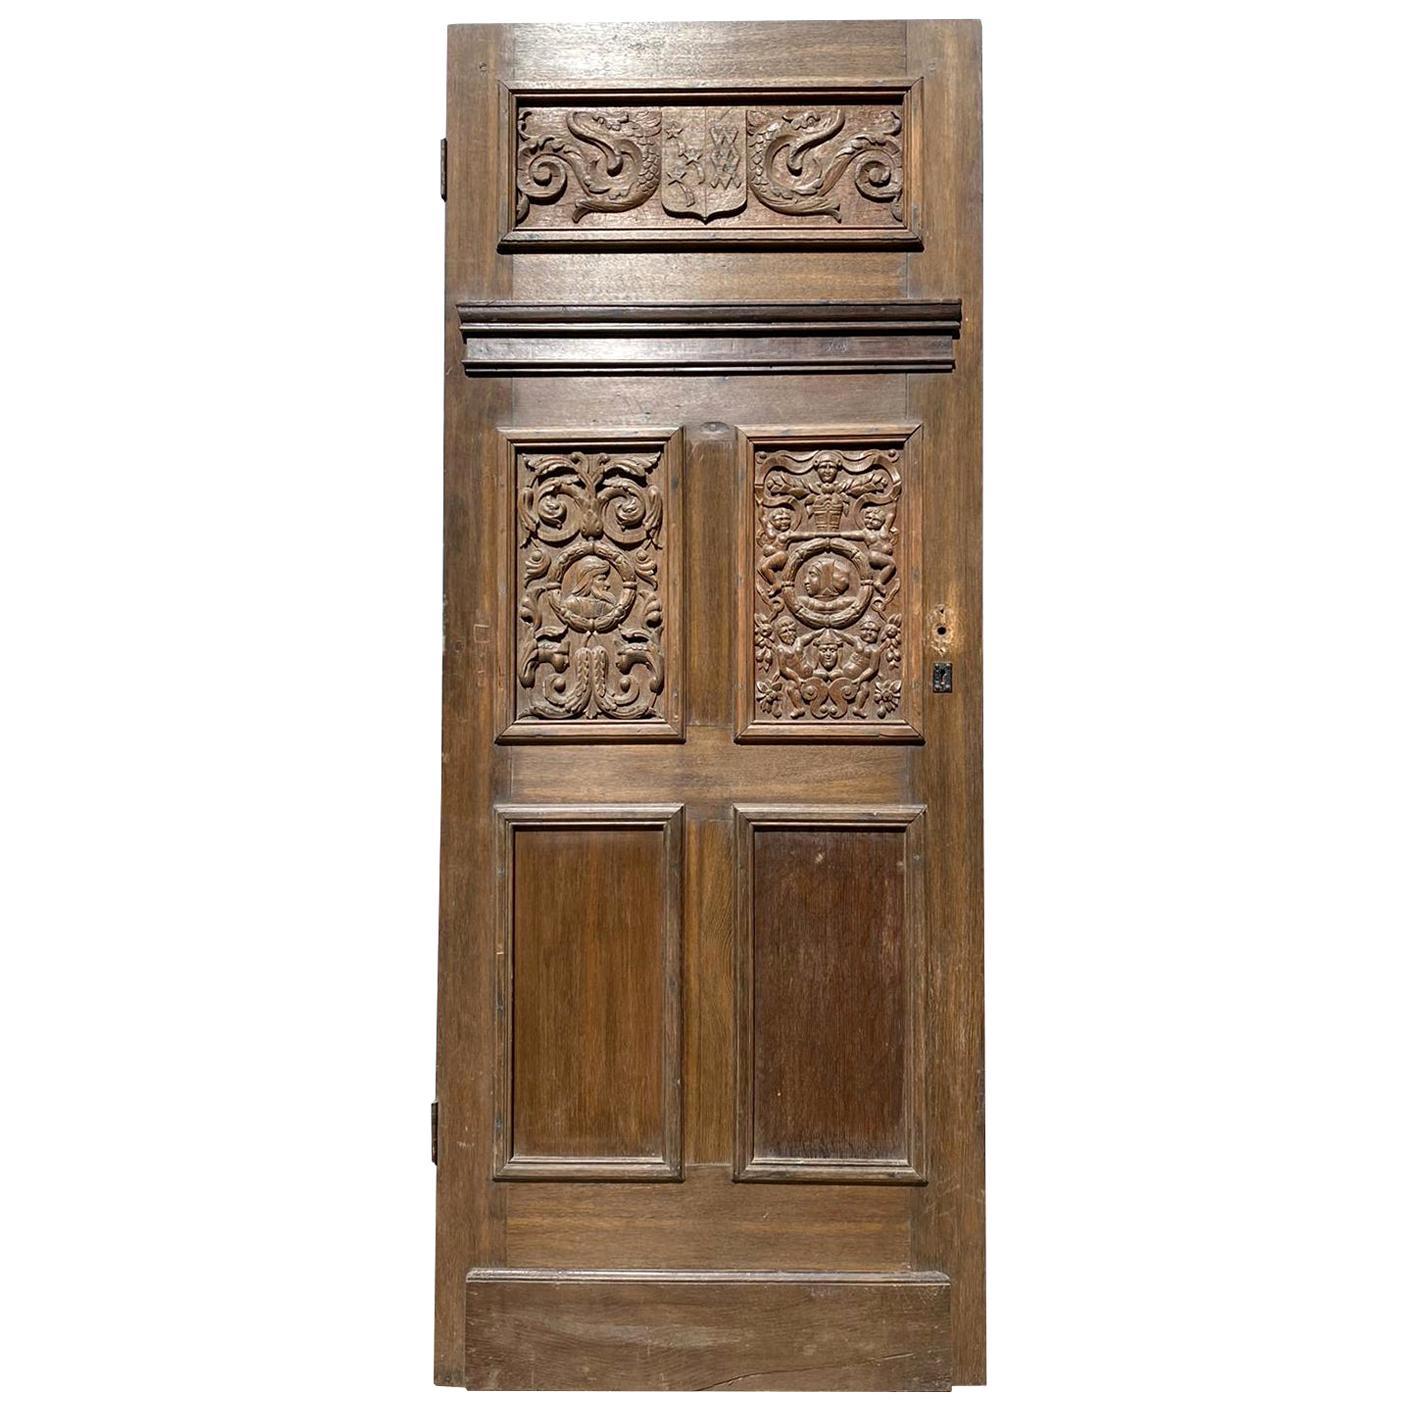 Antique English Jacobean Style Oak Door